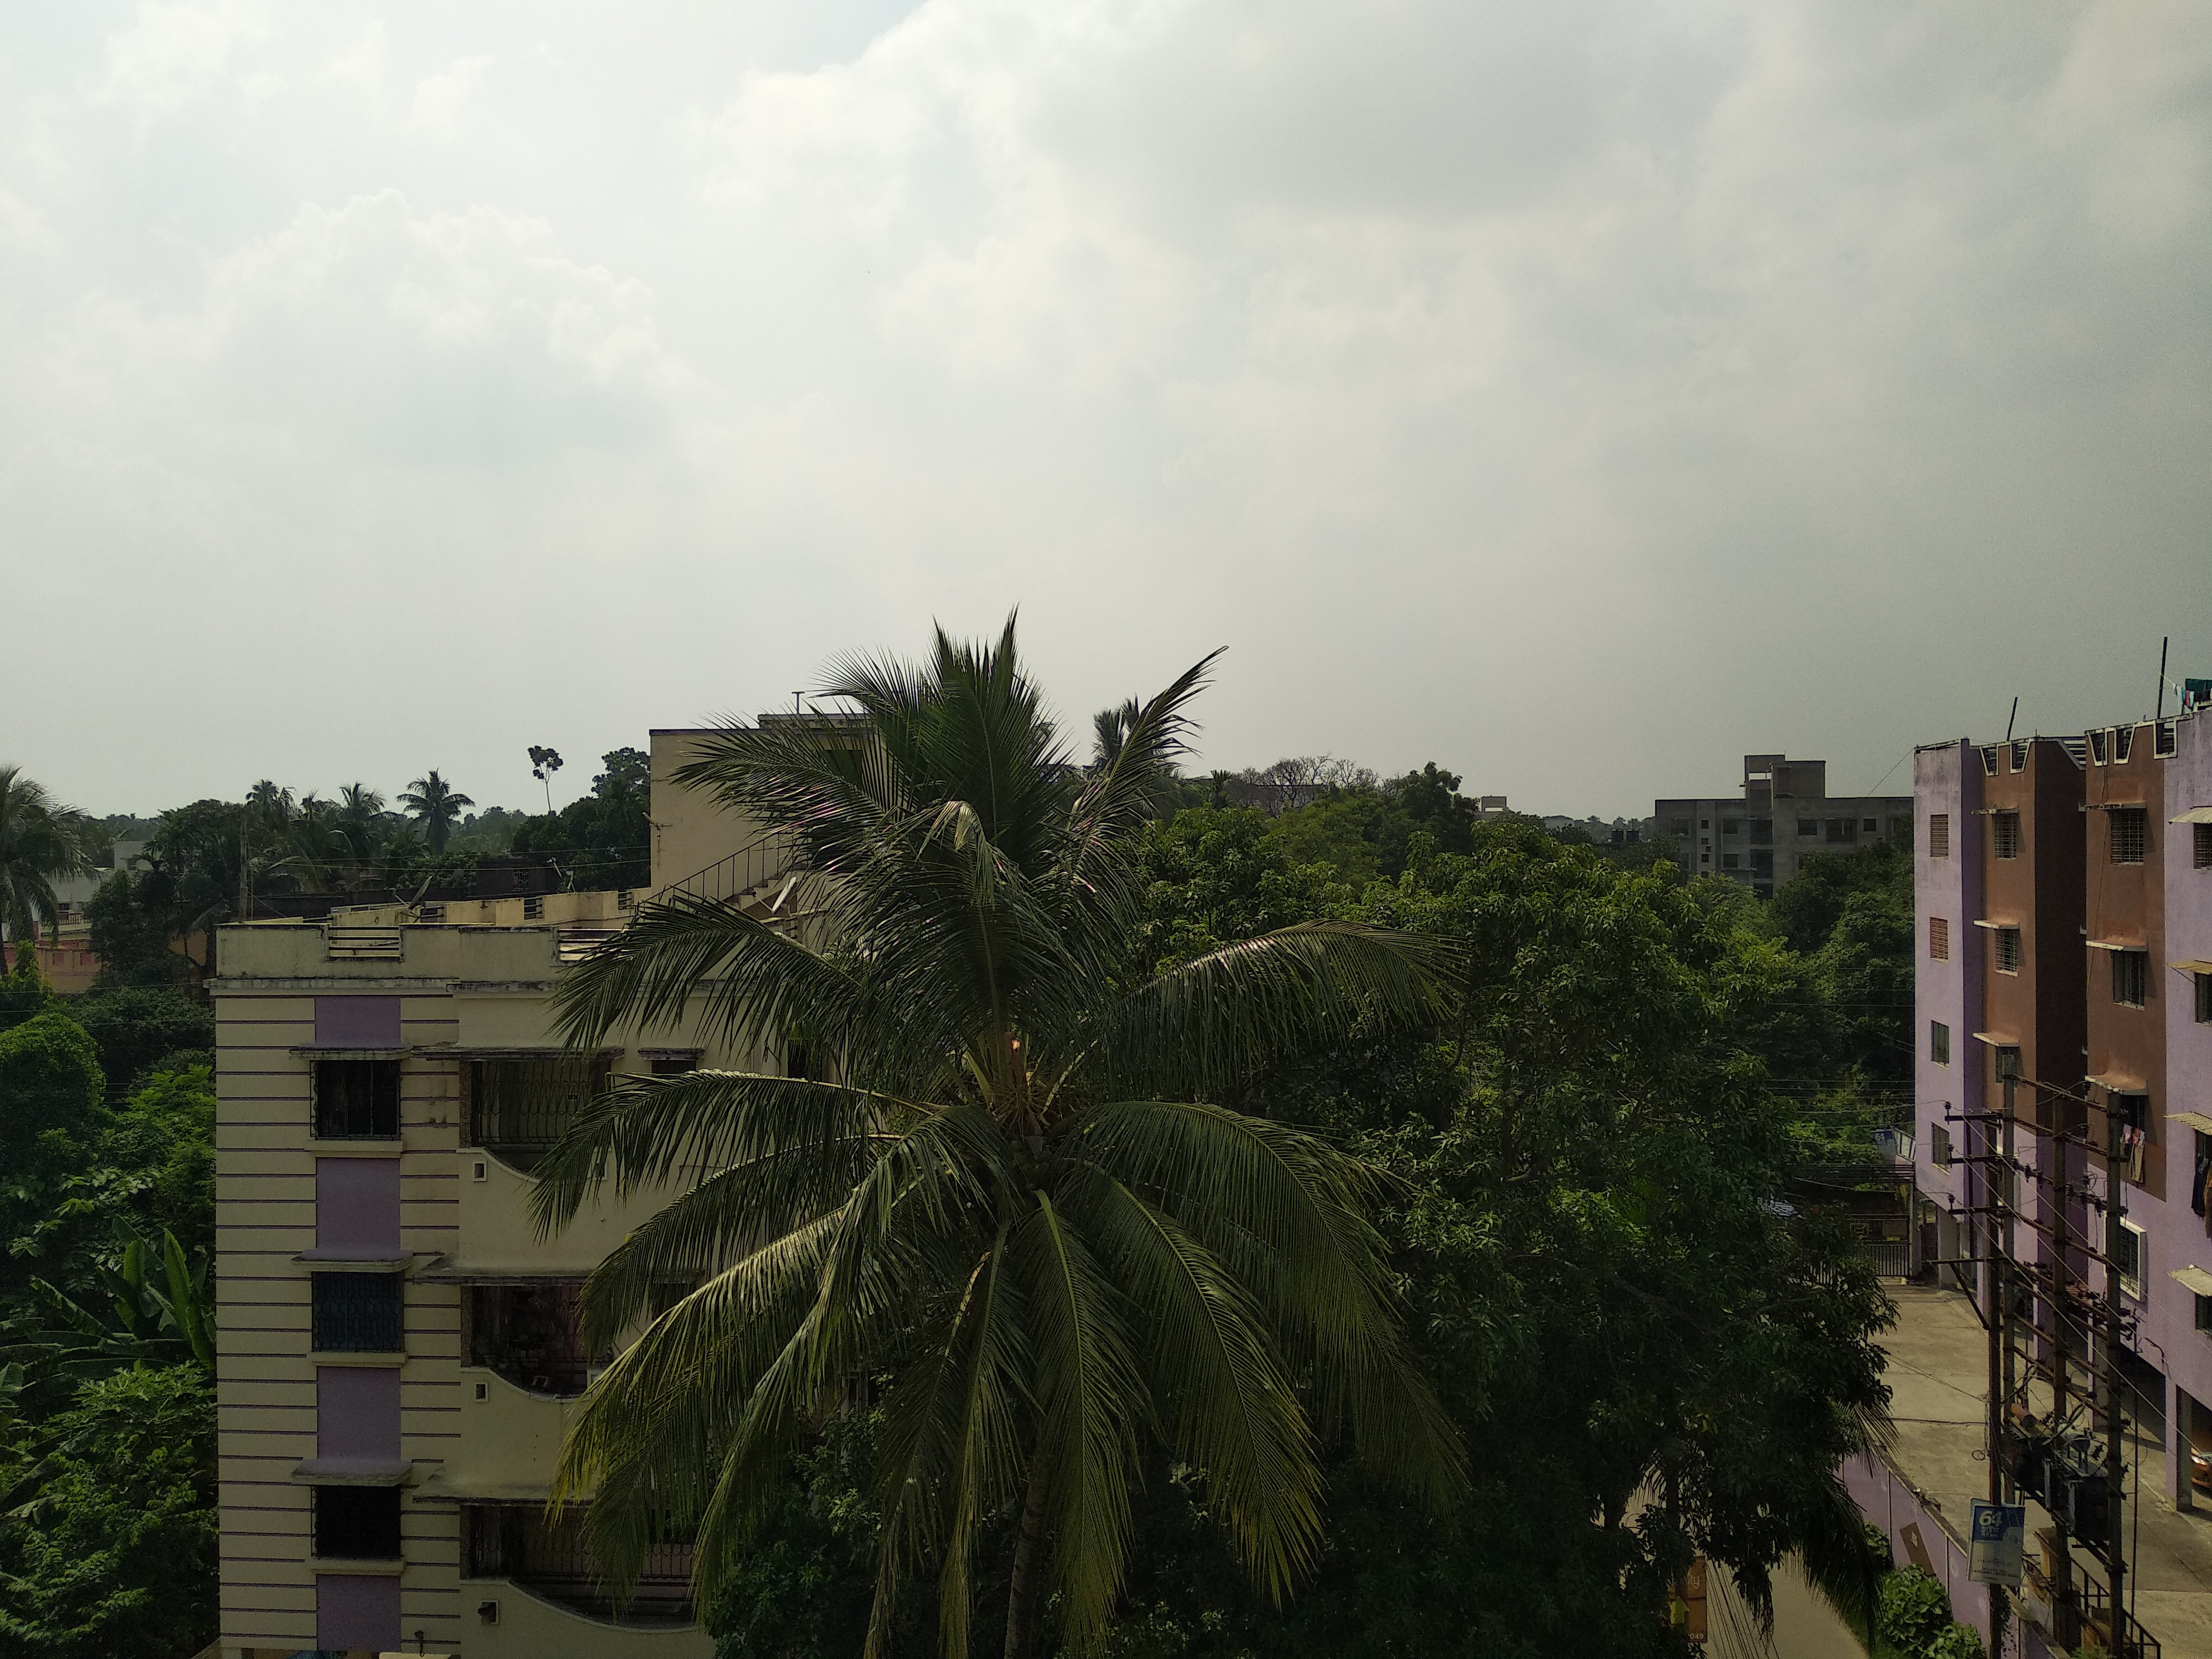 Kolkata Weather Update : বজ্রবিদ্যুৎ সহ বৃষ্টির সম্ভাবনা কলকাতায় ও জেলায়